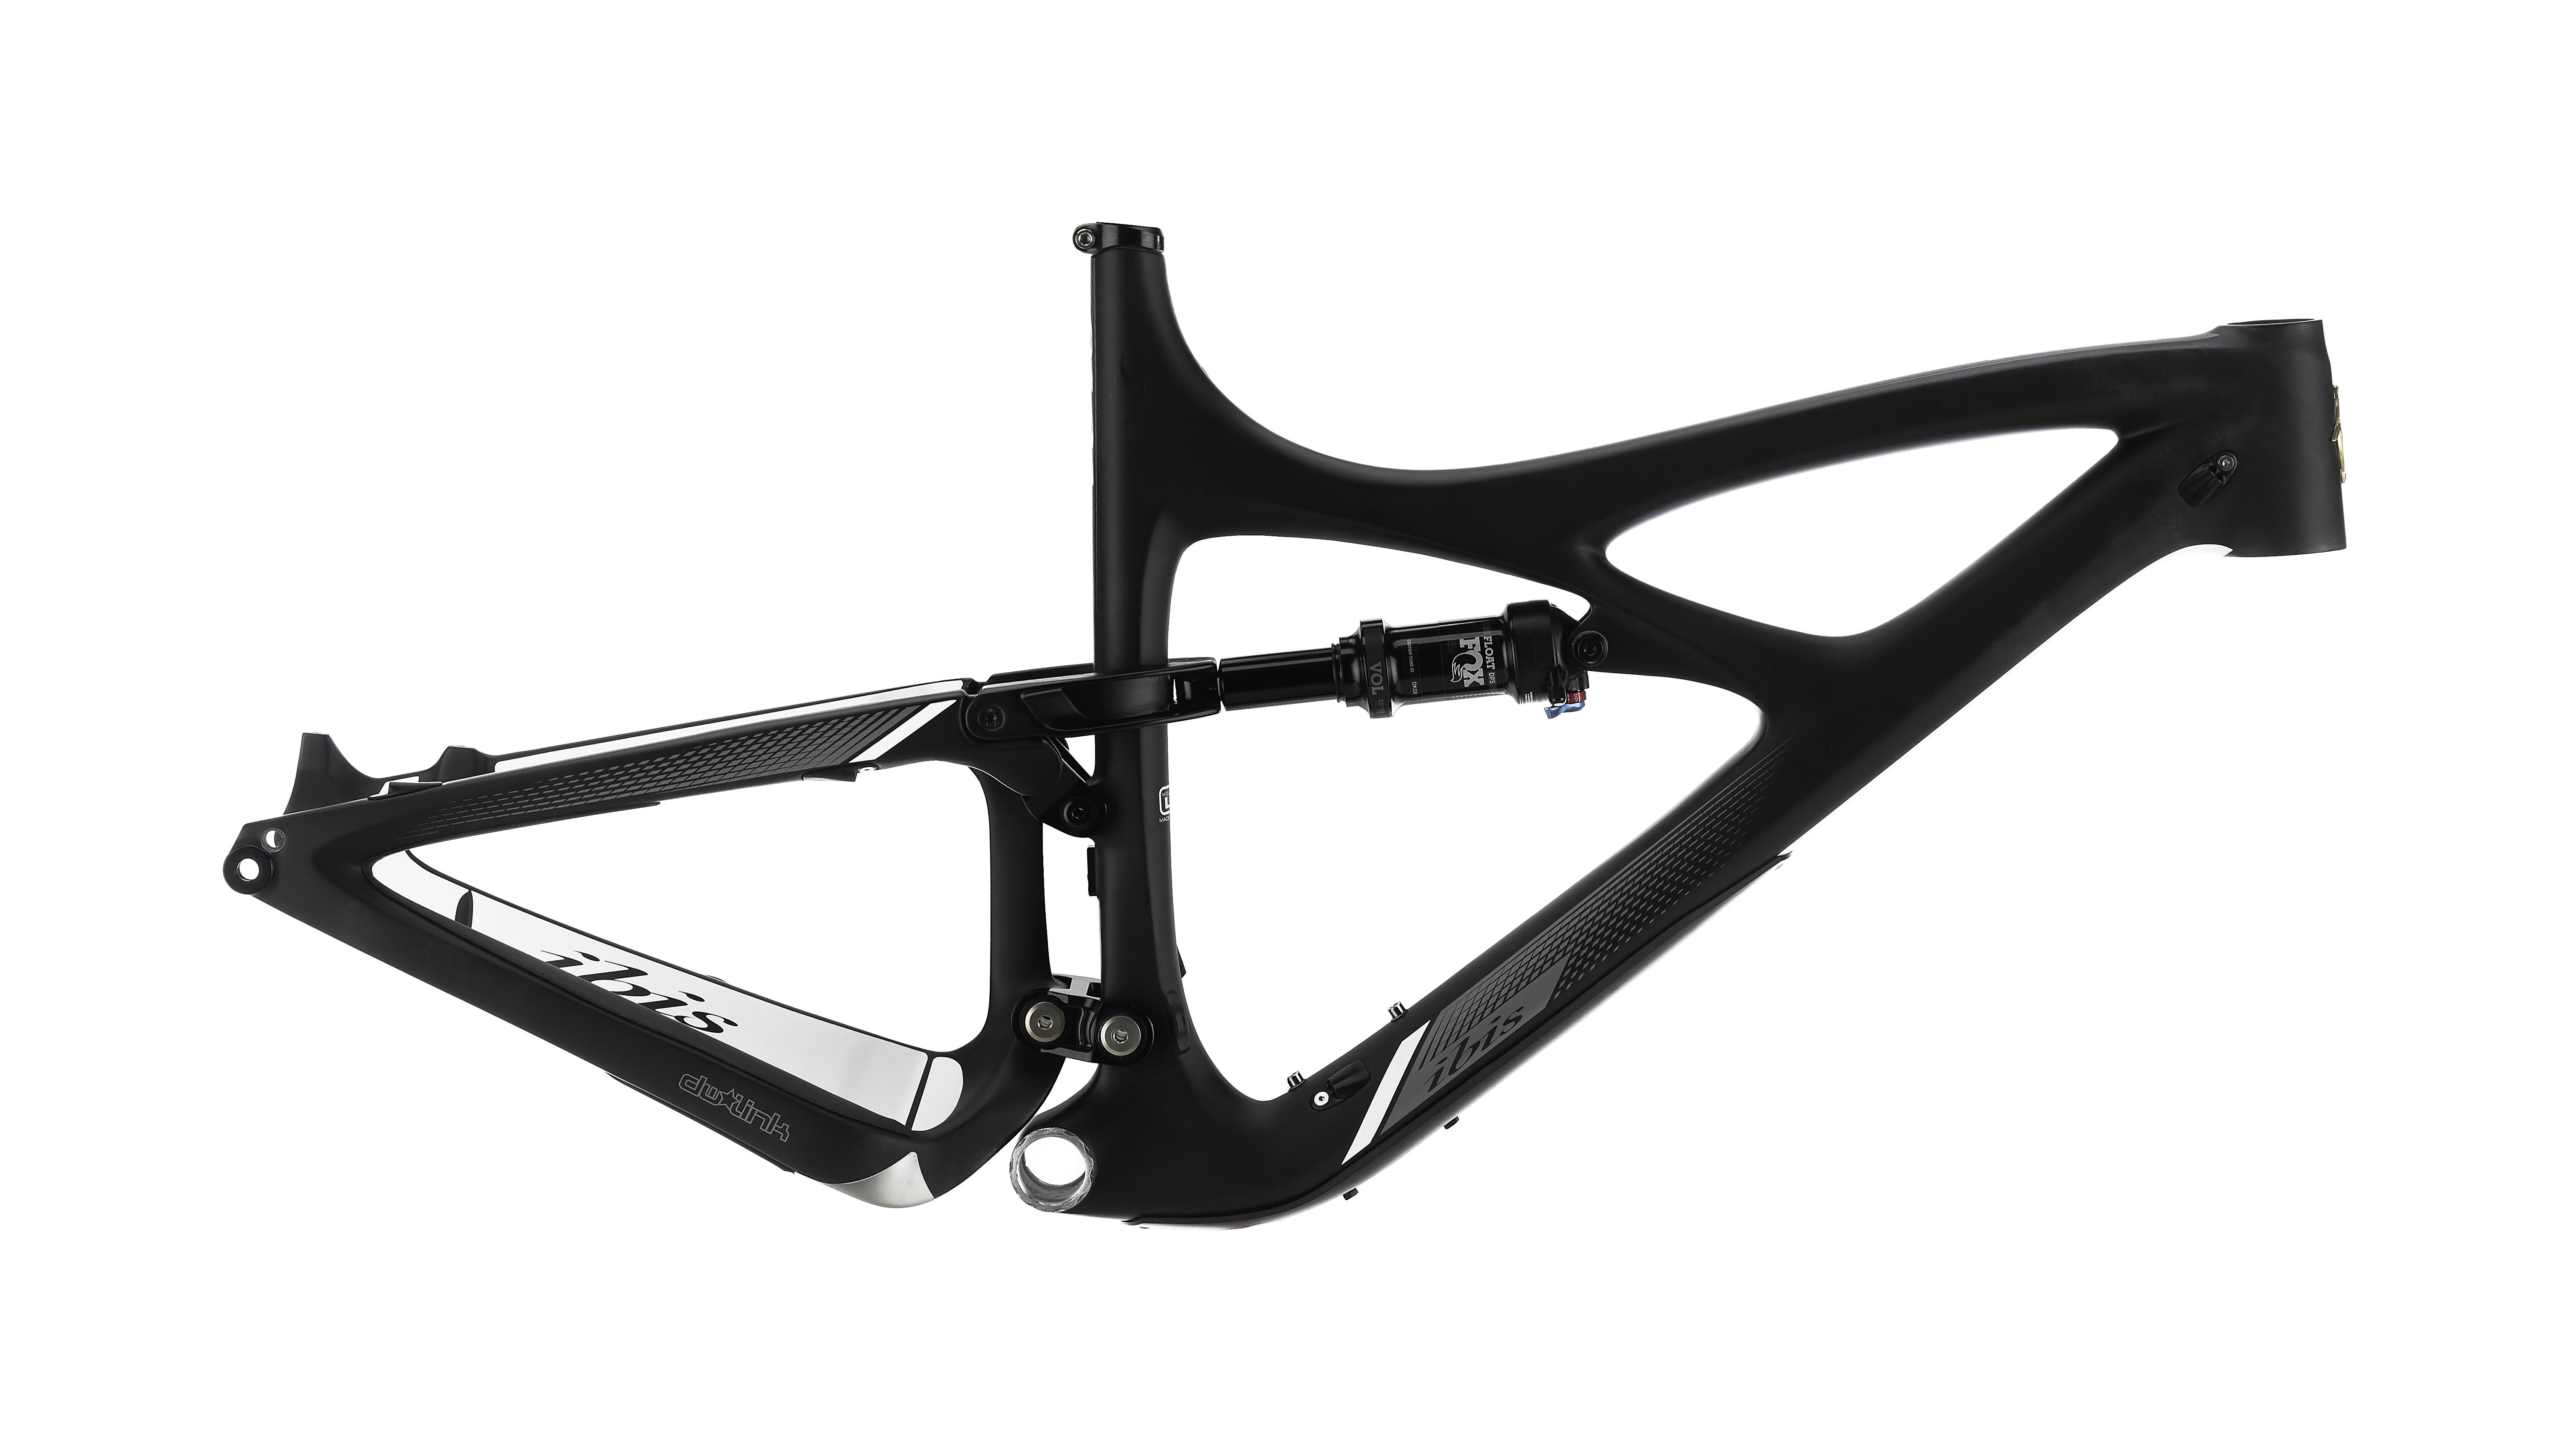 ibis mojo 3 bike frame for sale